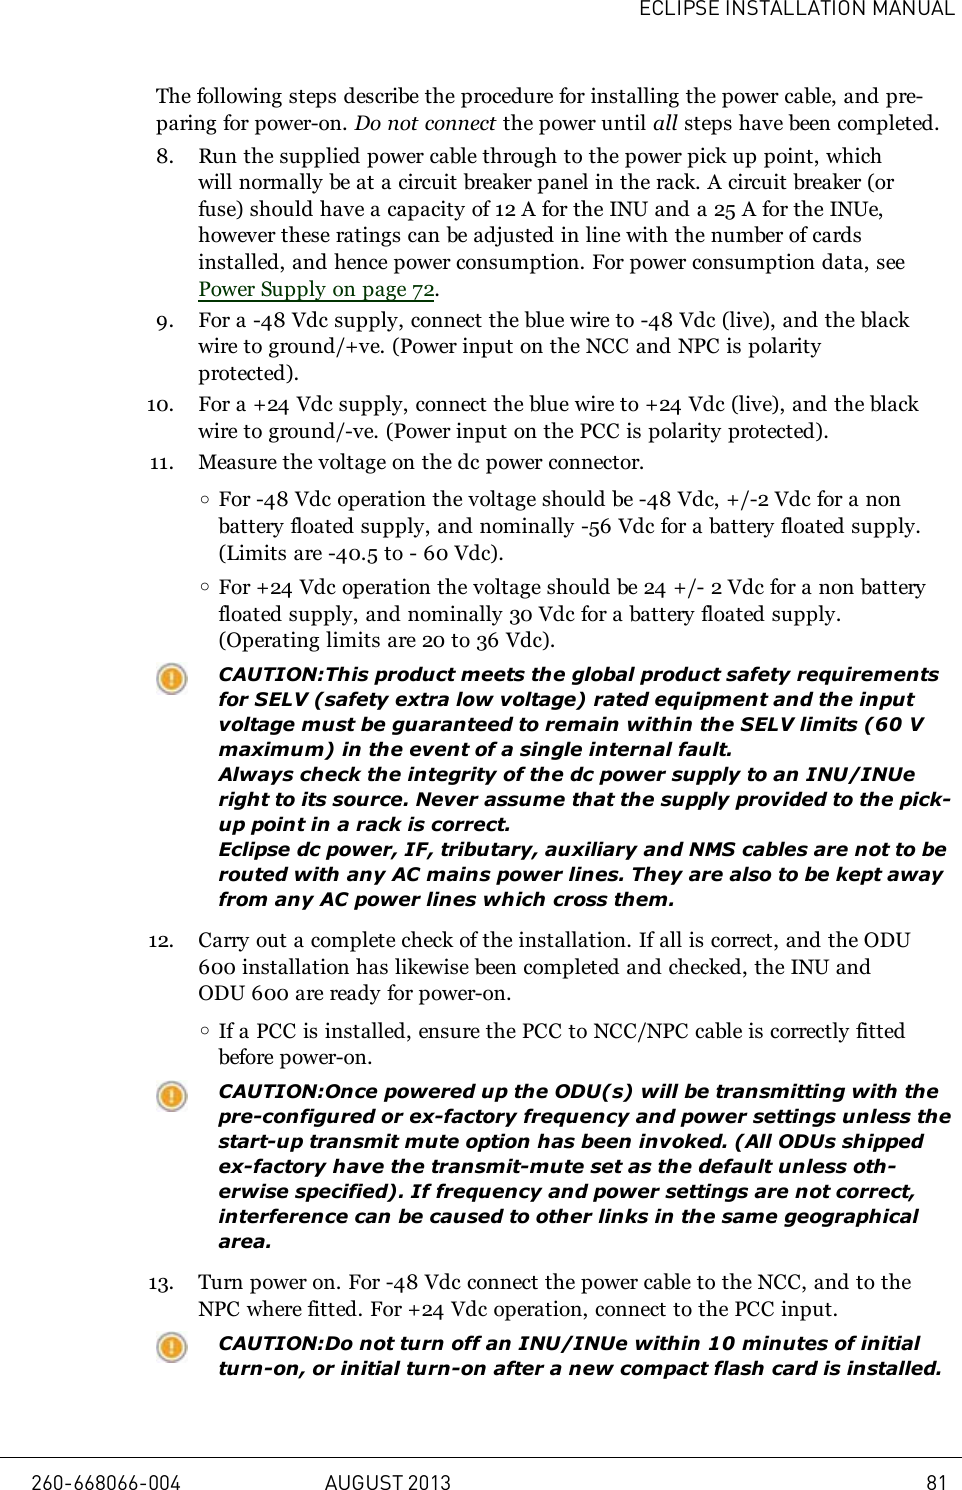 grundfos ups 25 60 user manual